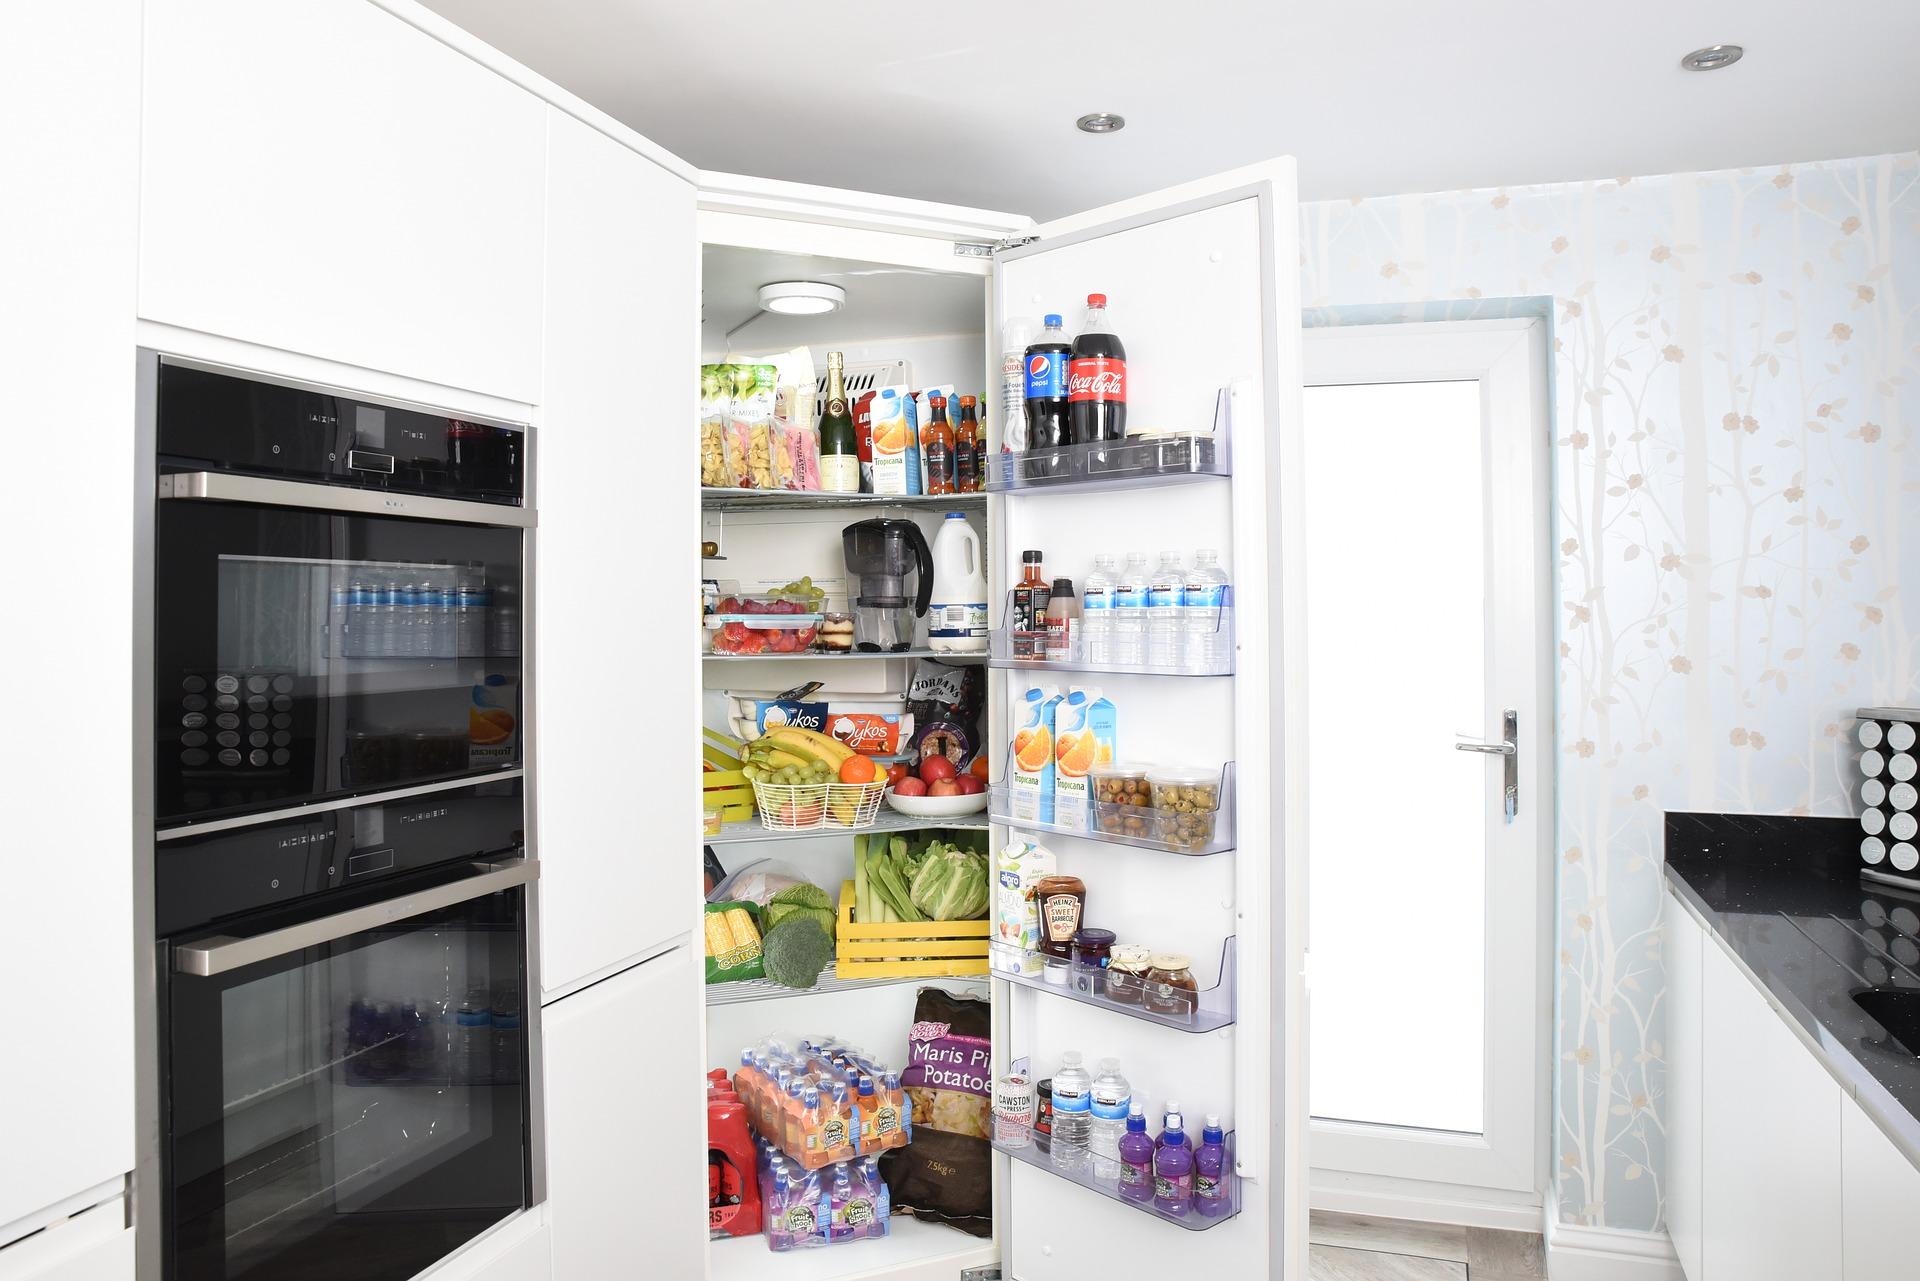 fridge-3475996_1920.jpg